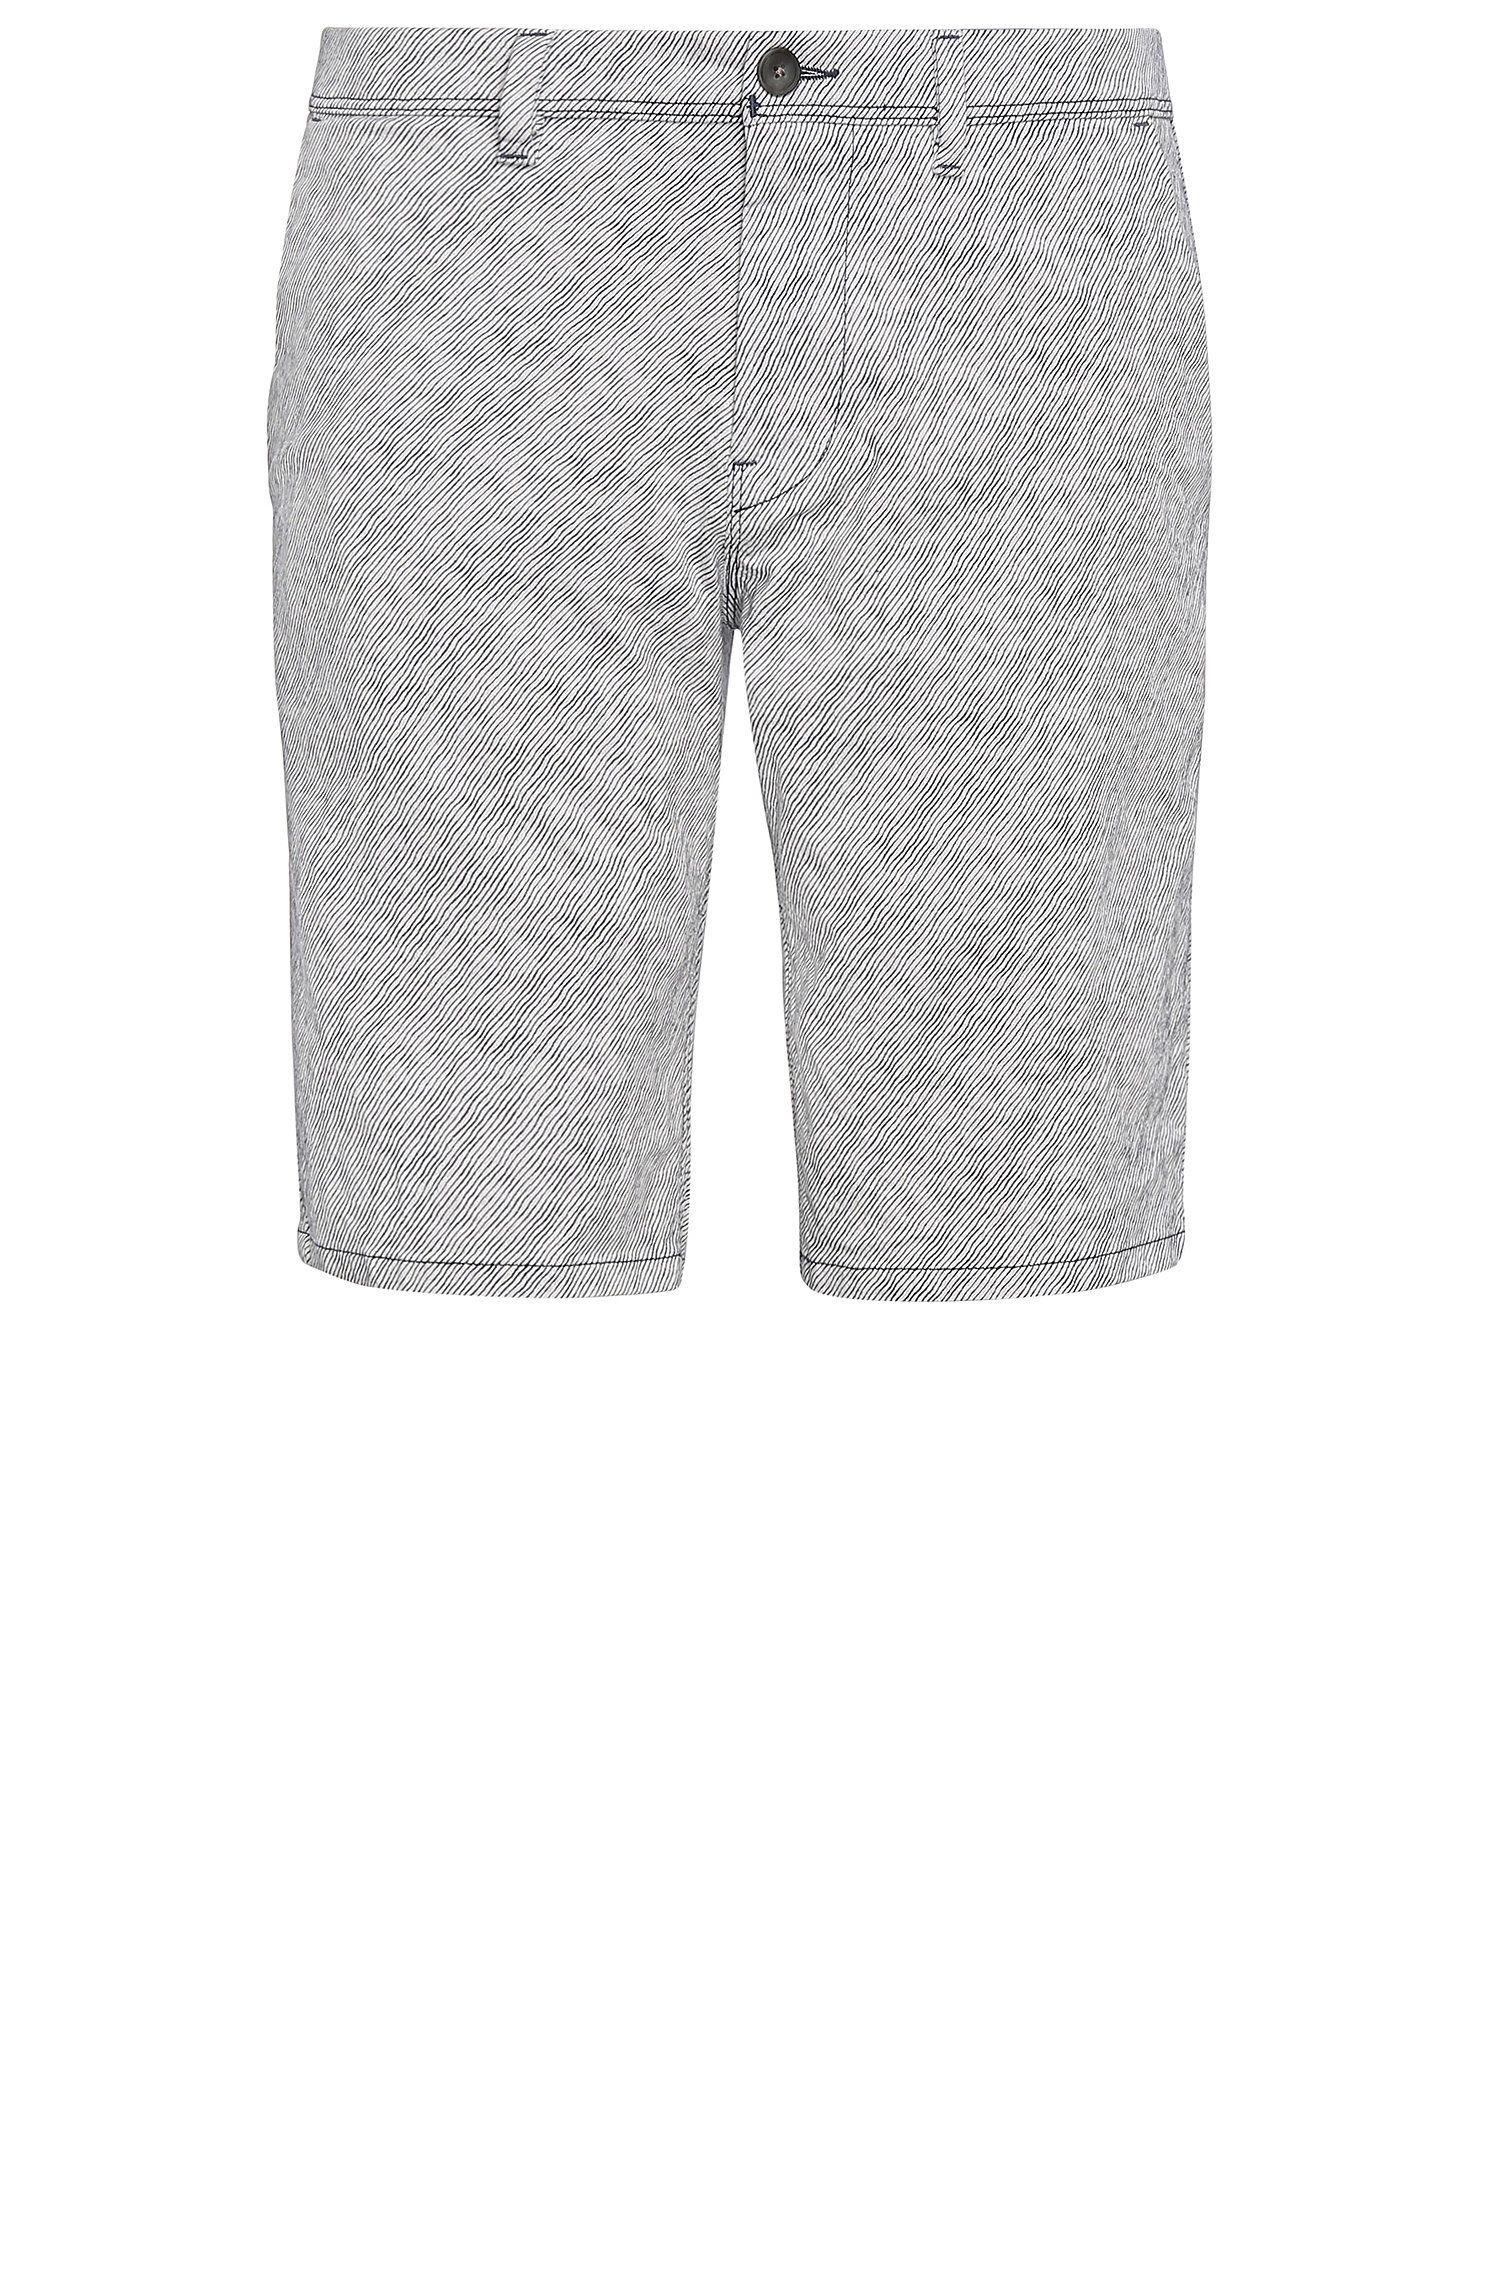 'Slender Shorts W' | Slim Fit, Stretch Cotton Striped Shorts